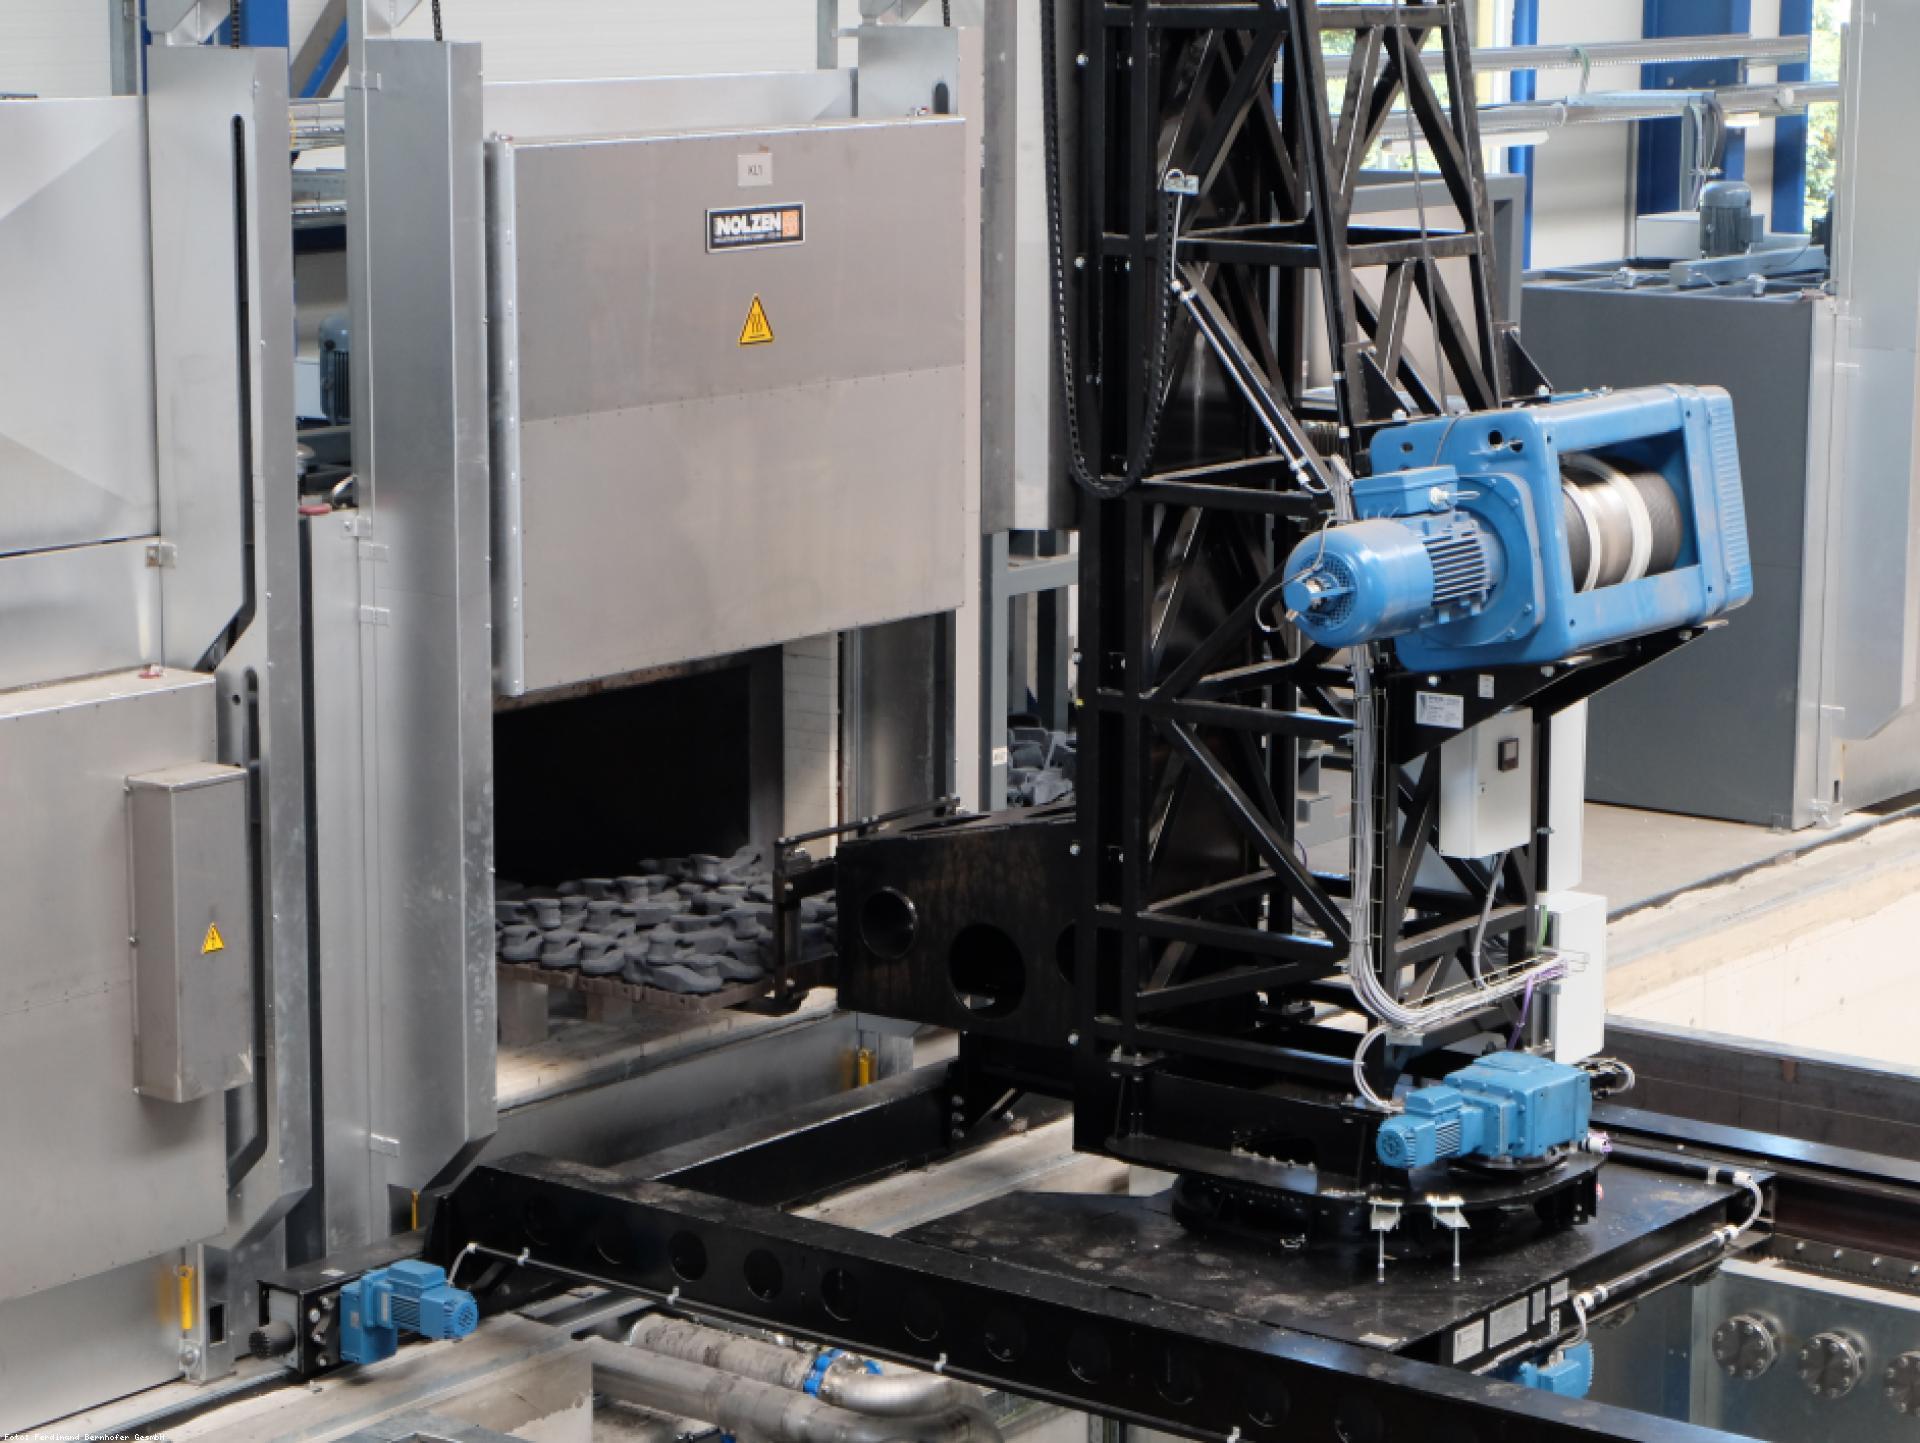 Mood-Image EBG Referenz: Ferdinand Bernhofer GesmbH - Neubau Lager-Produktionshalle Umkleiden Kühlwasserversorgung